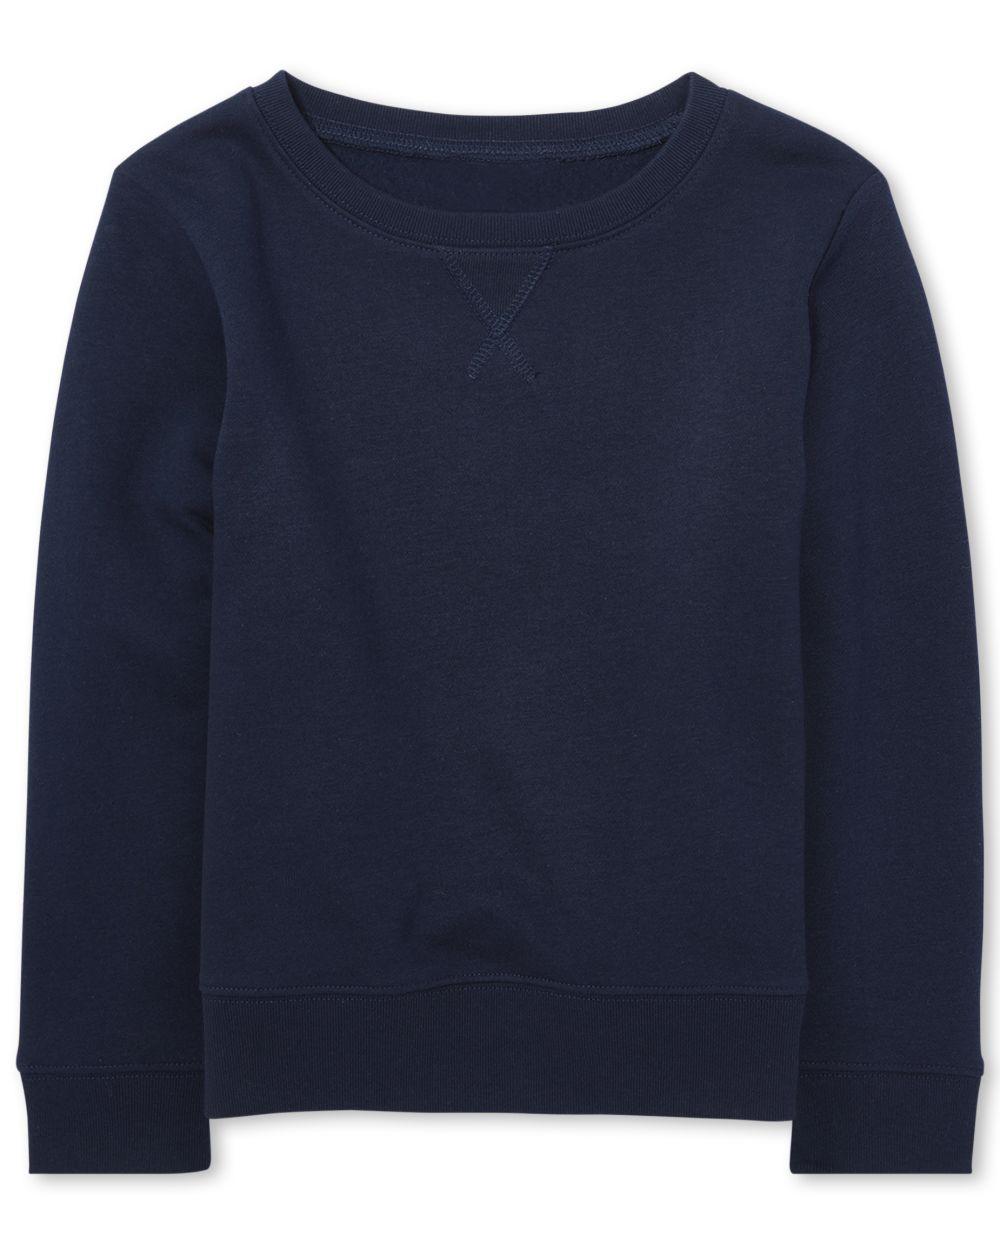 Girls Uniform Active French Terry Sweatshirt